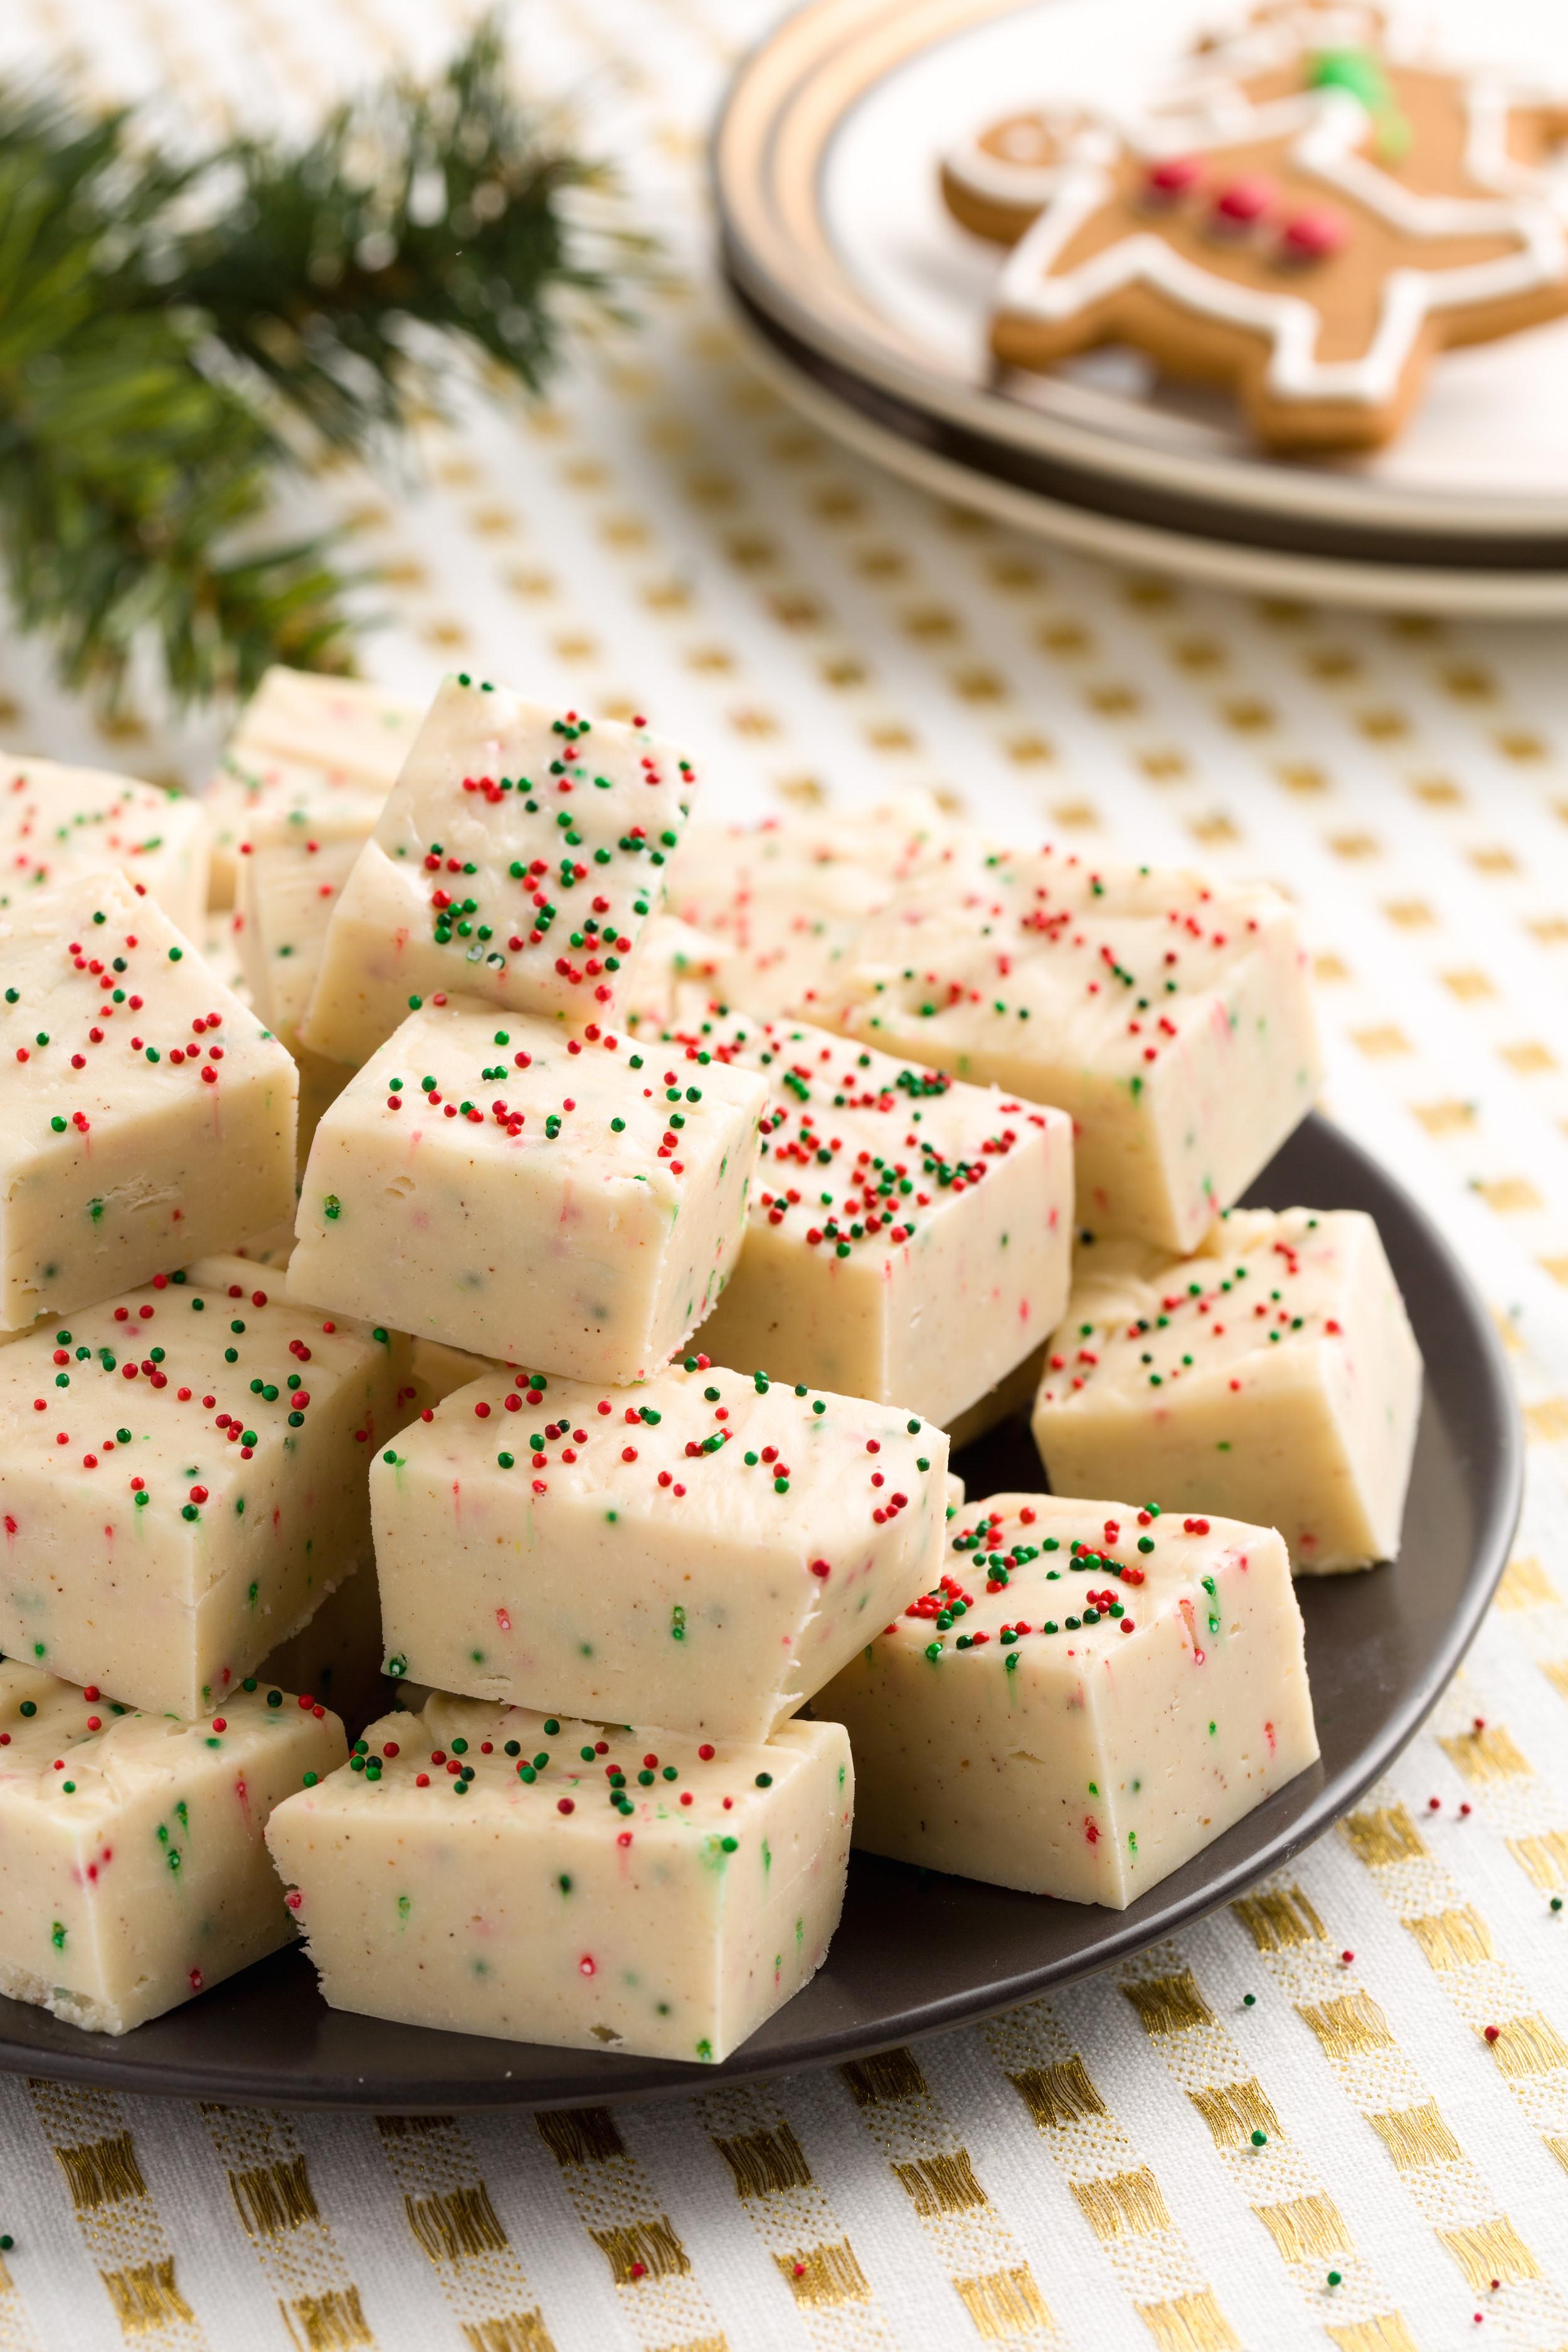 Easy Homemade Christmas Candy  18 Easy Homemade Christmas Candy Recipes How To Make